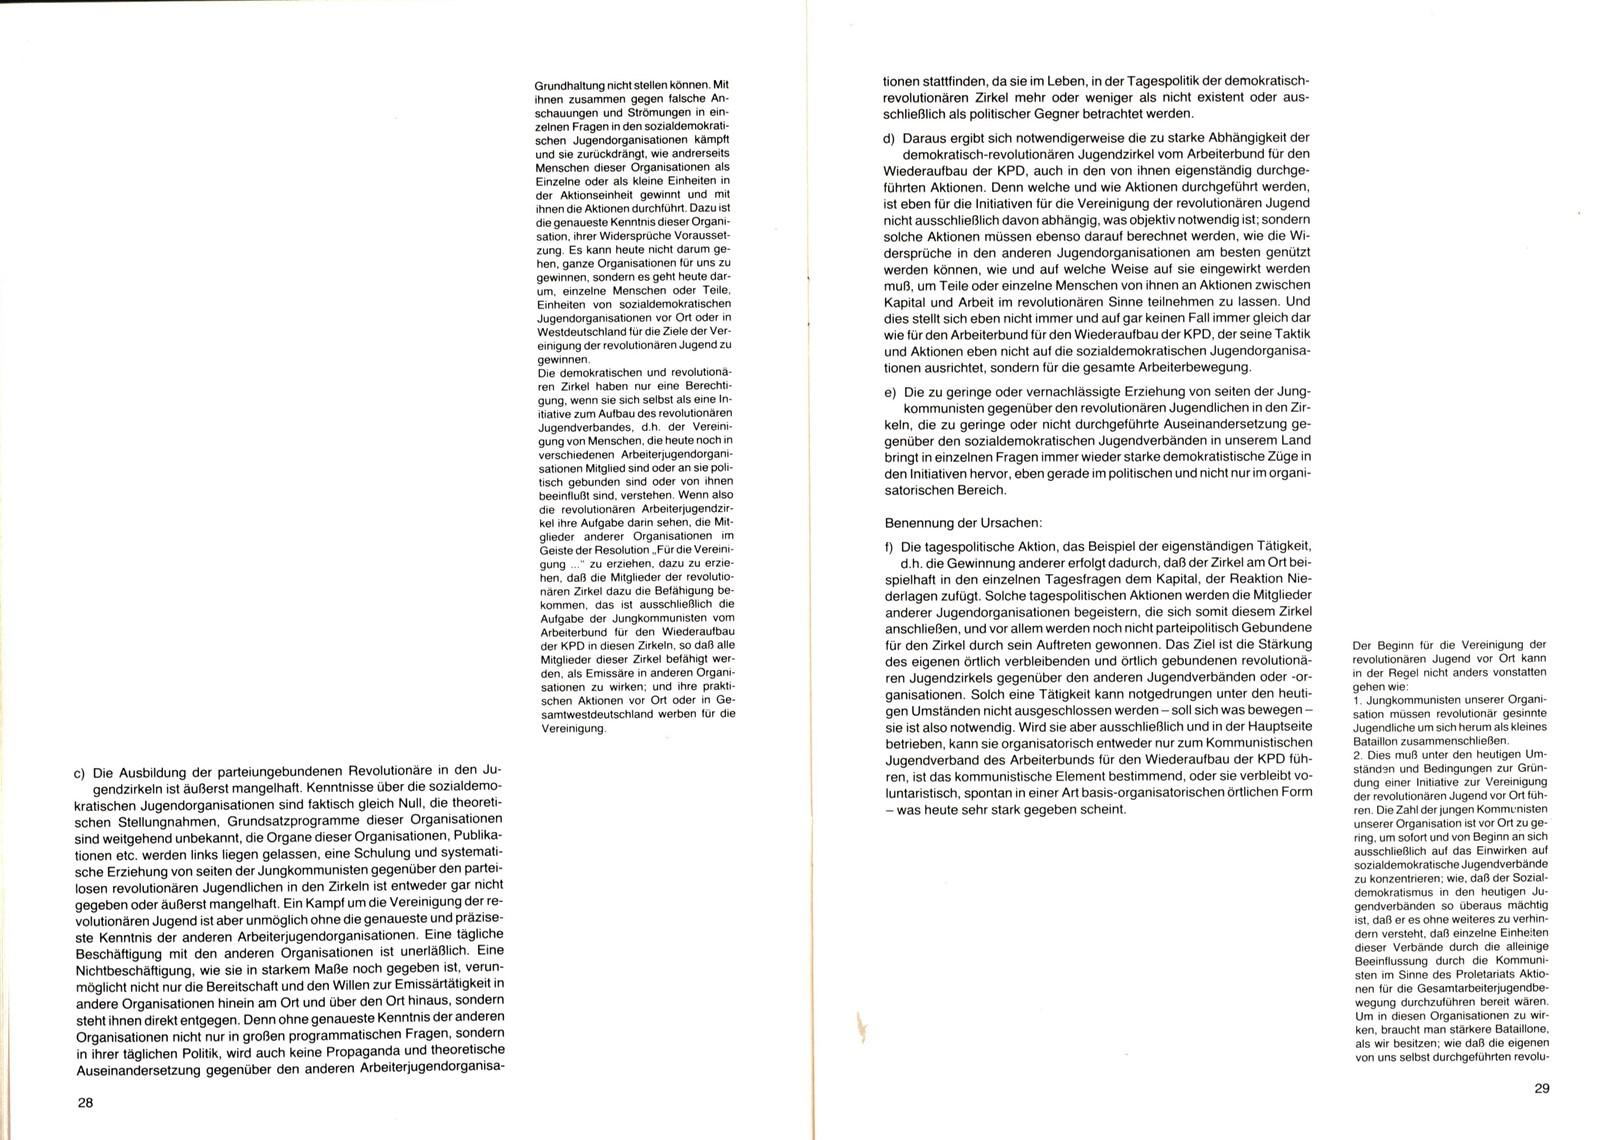 ABG_1985_Beschluesse_IV_Delegiertenkonferenz_16